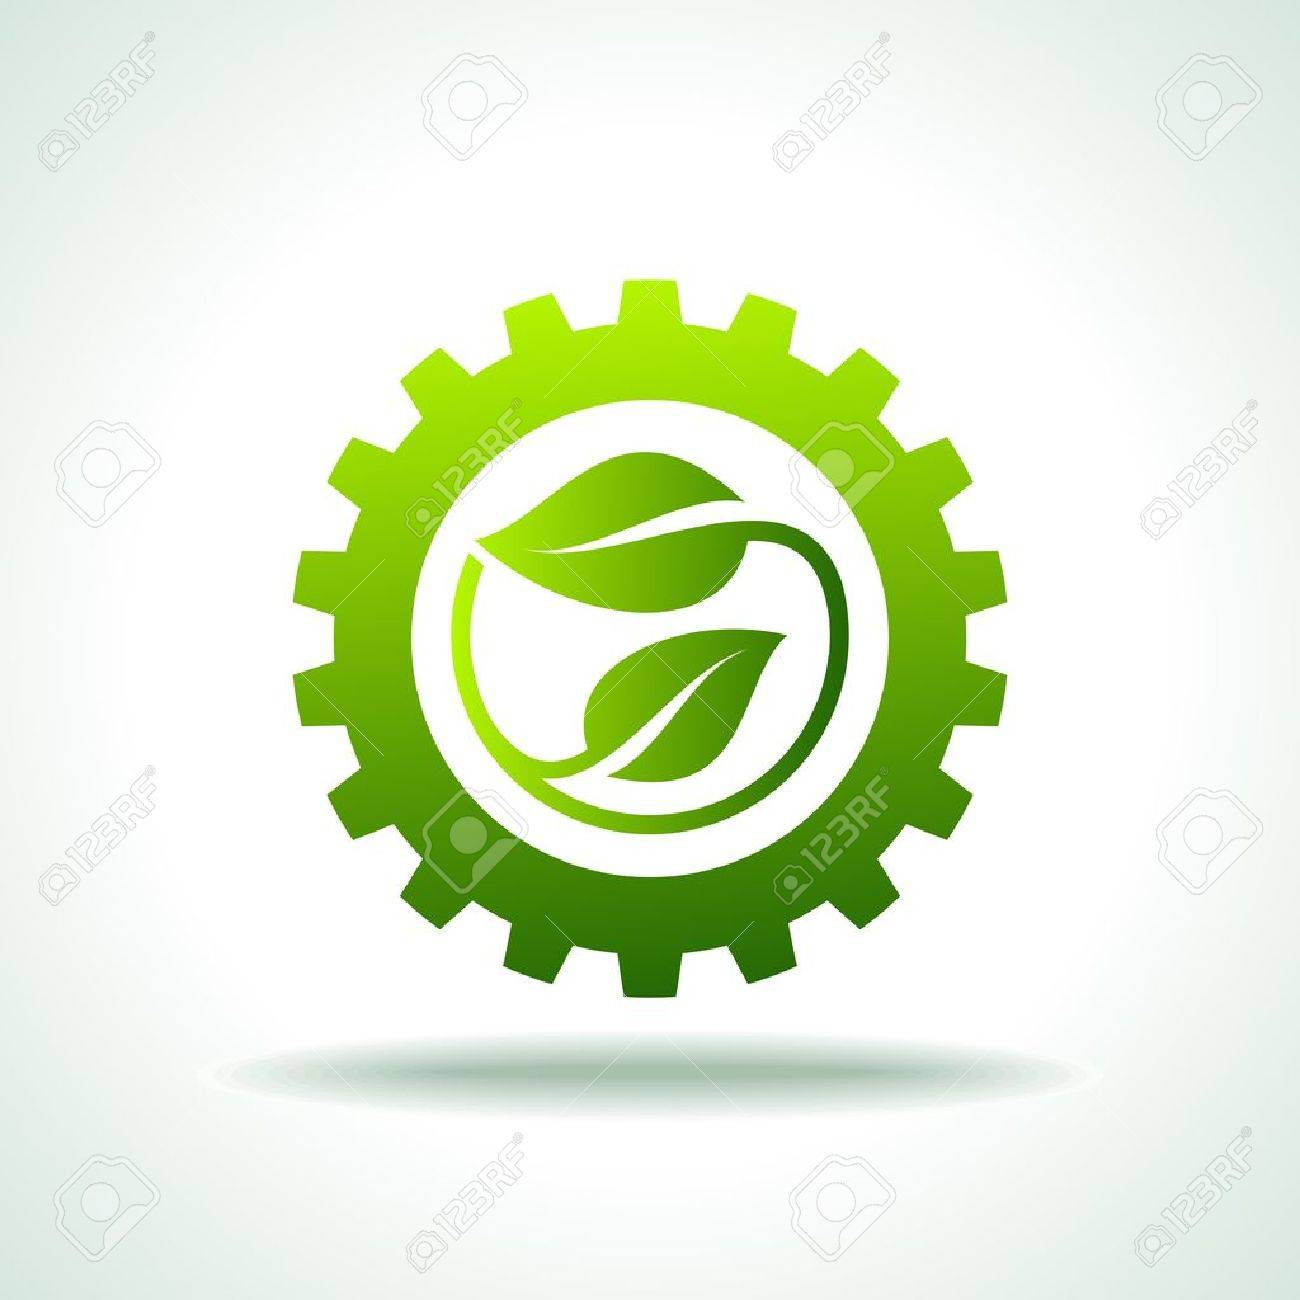 environmentally friendly industries Stock Vector - 17636943